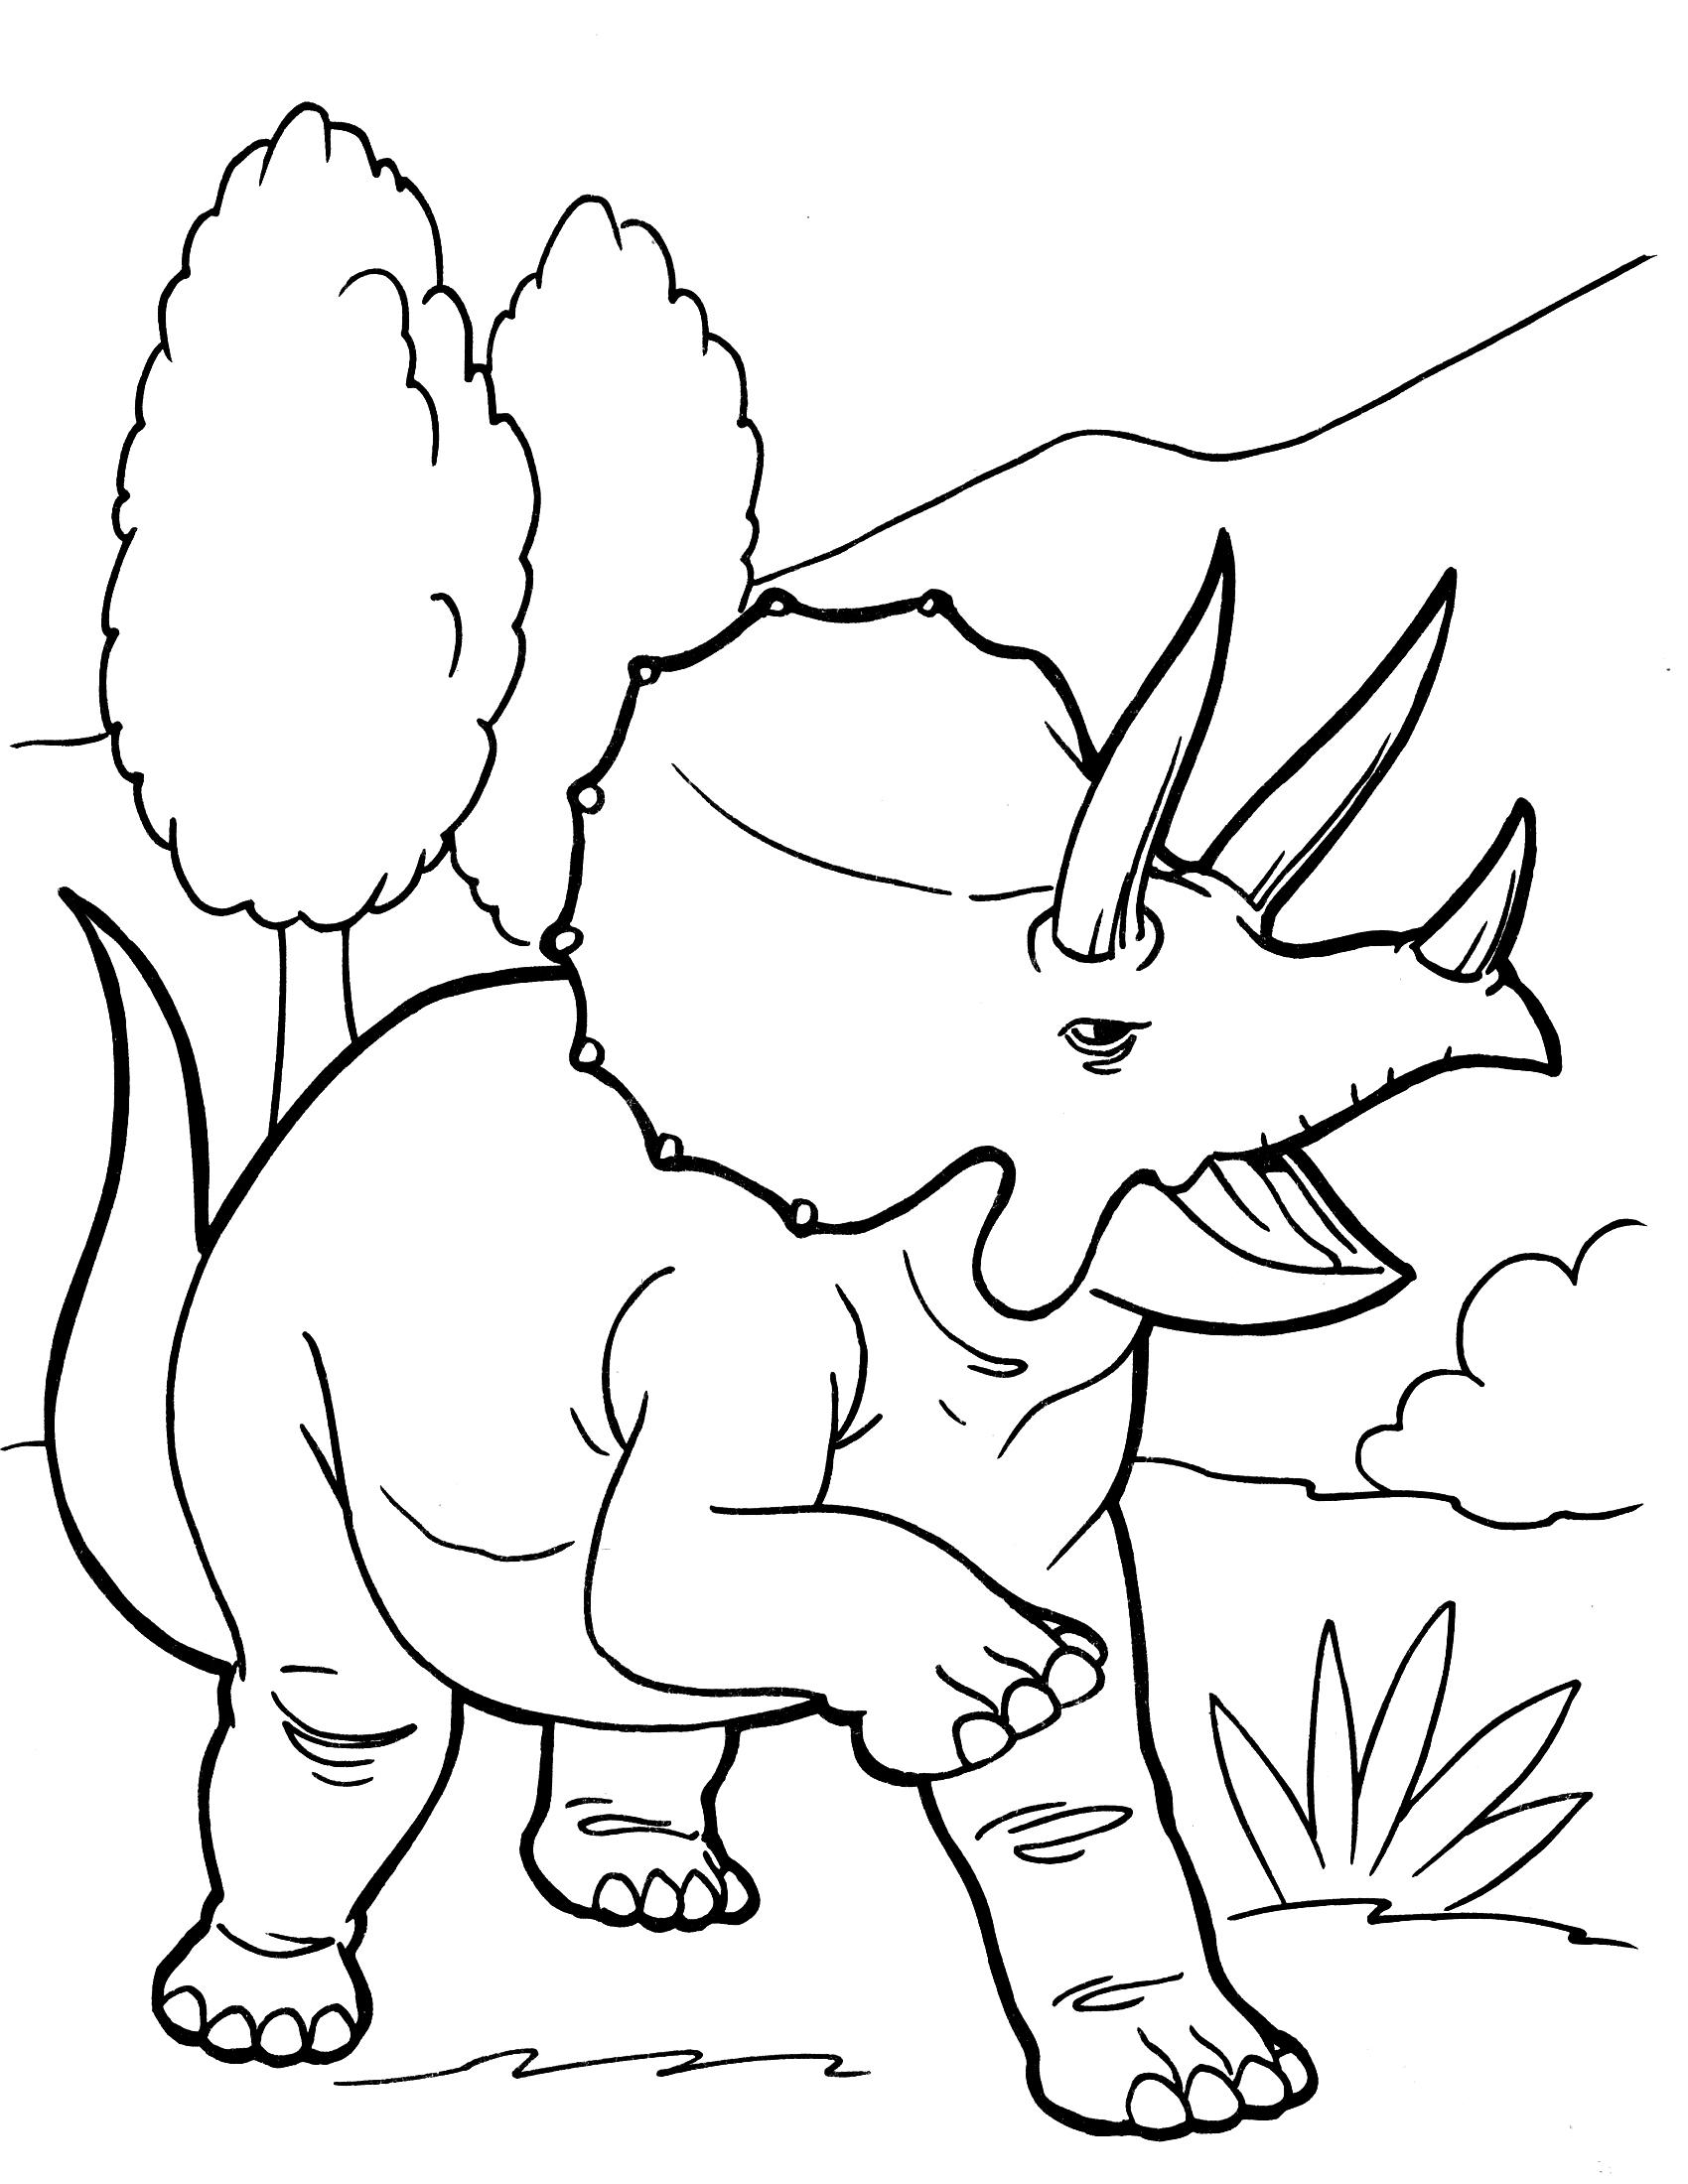 1700x2200 Dinosaur Paintings For Kids Description From Dinosaur Painting